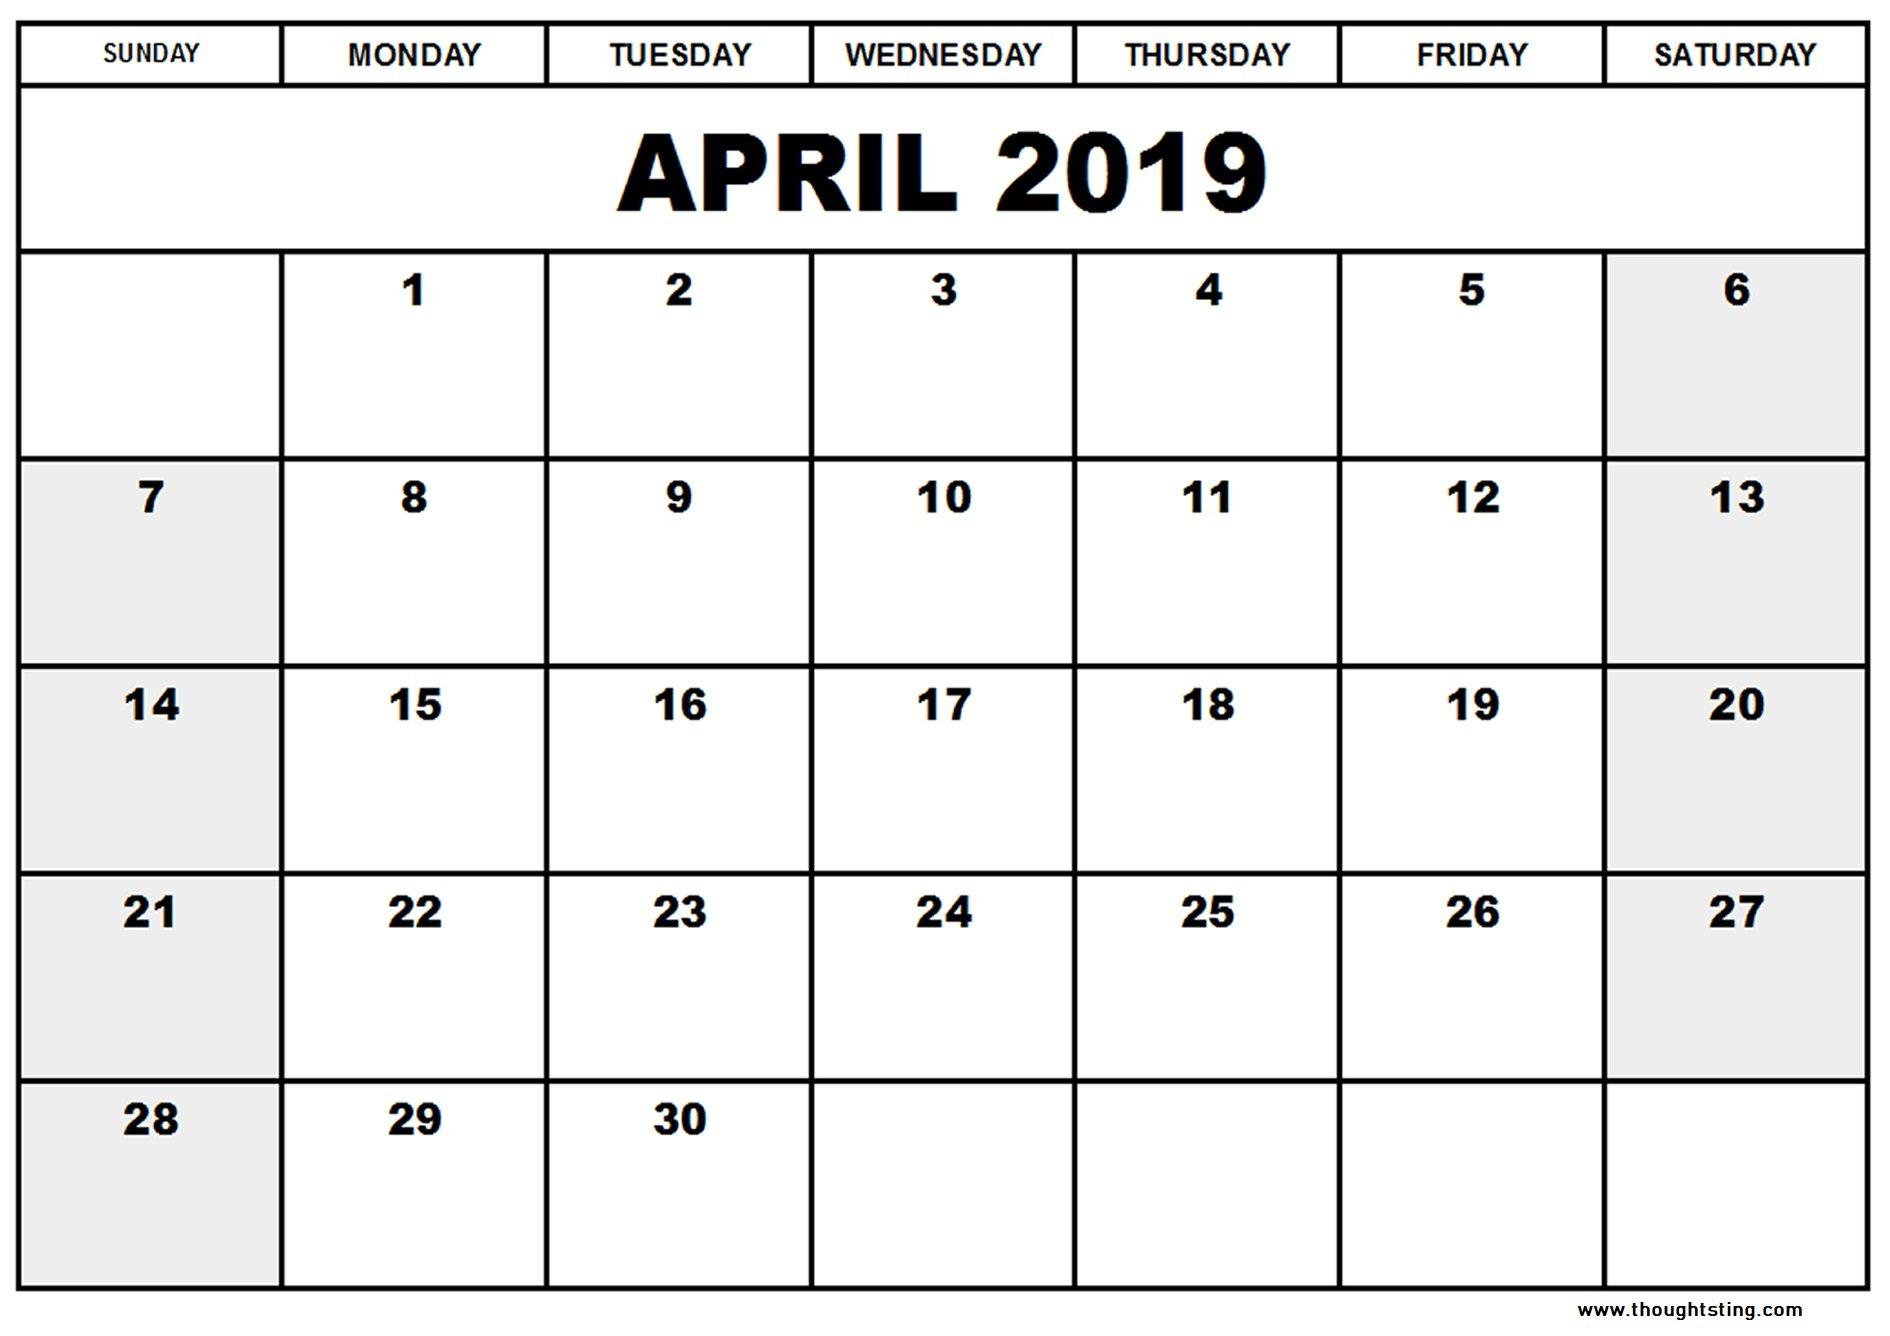 April 2019 Calendar Template Word, Excel, Pdf - Free Printable Calendar 2019 Template Pdf